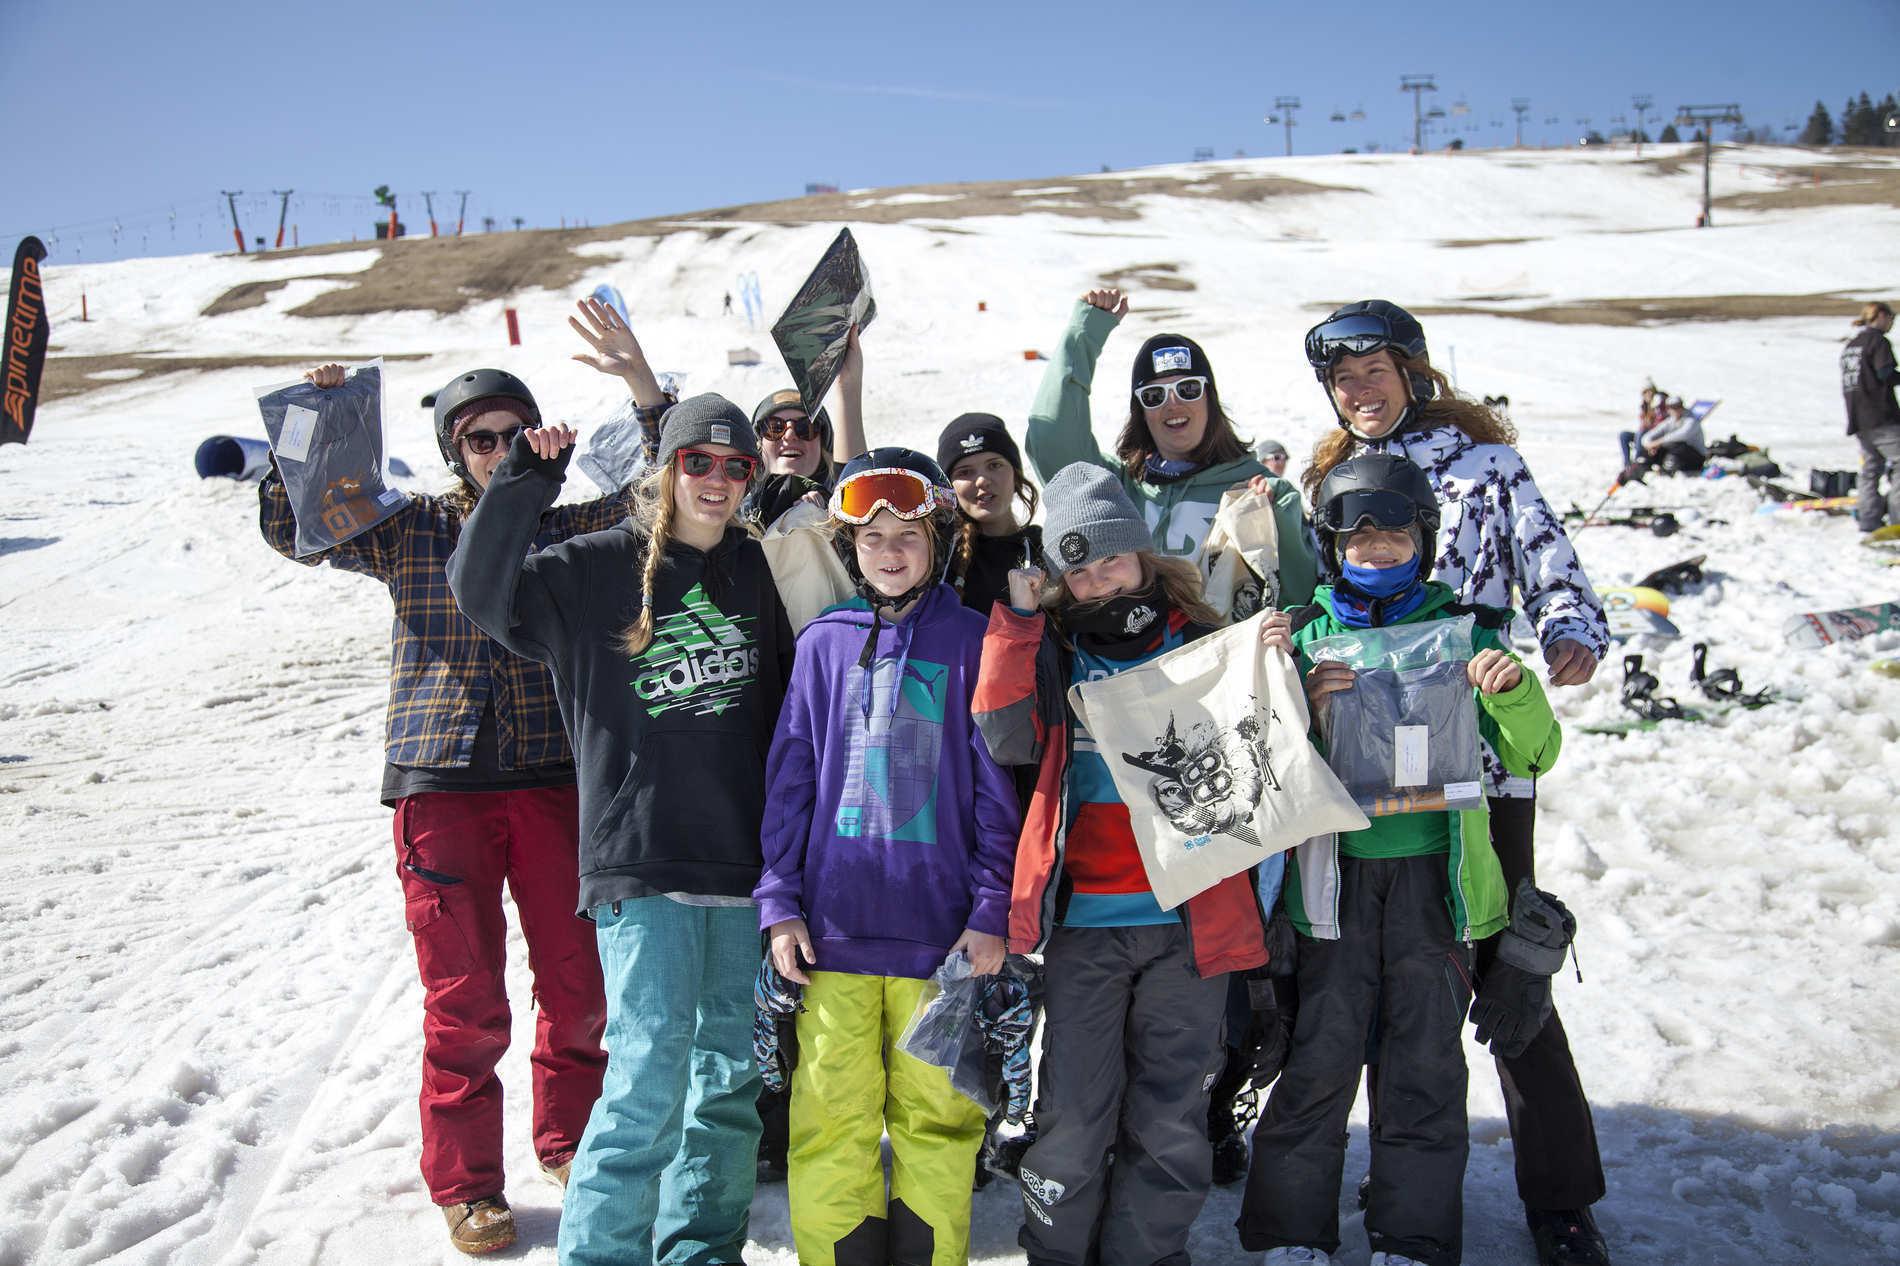 web snowpark feldberg 25 03 2017 lifestyle fs sb martin herrmann qparks 38